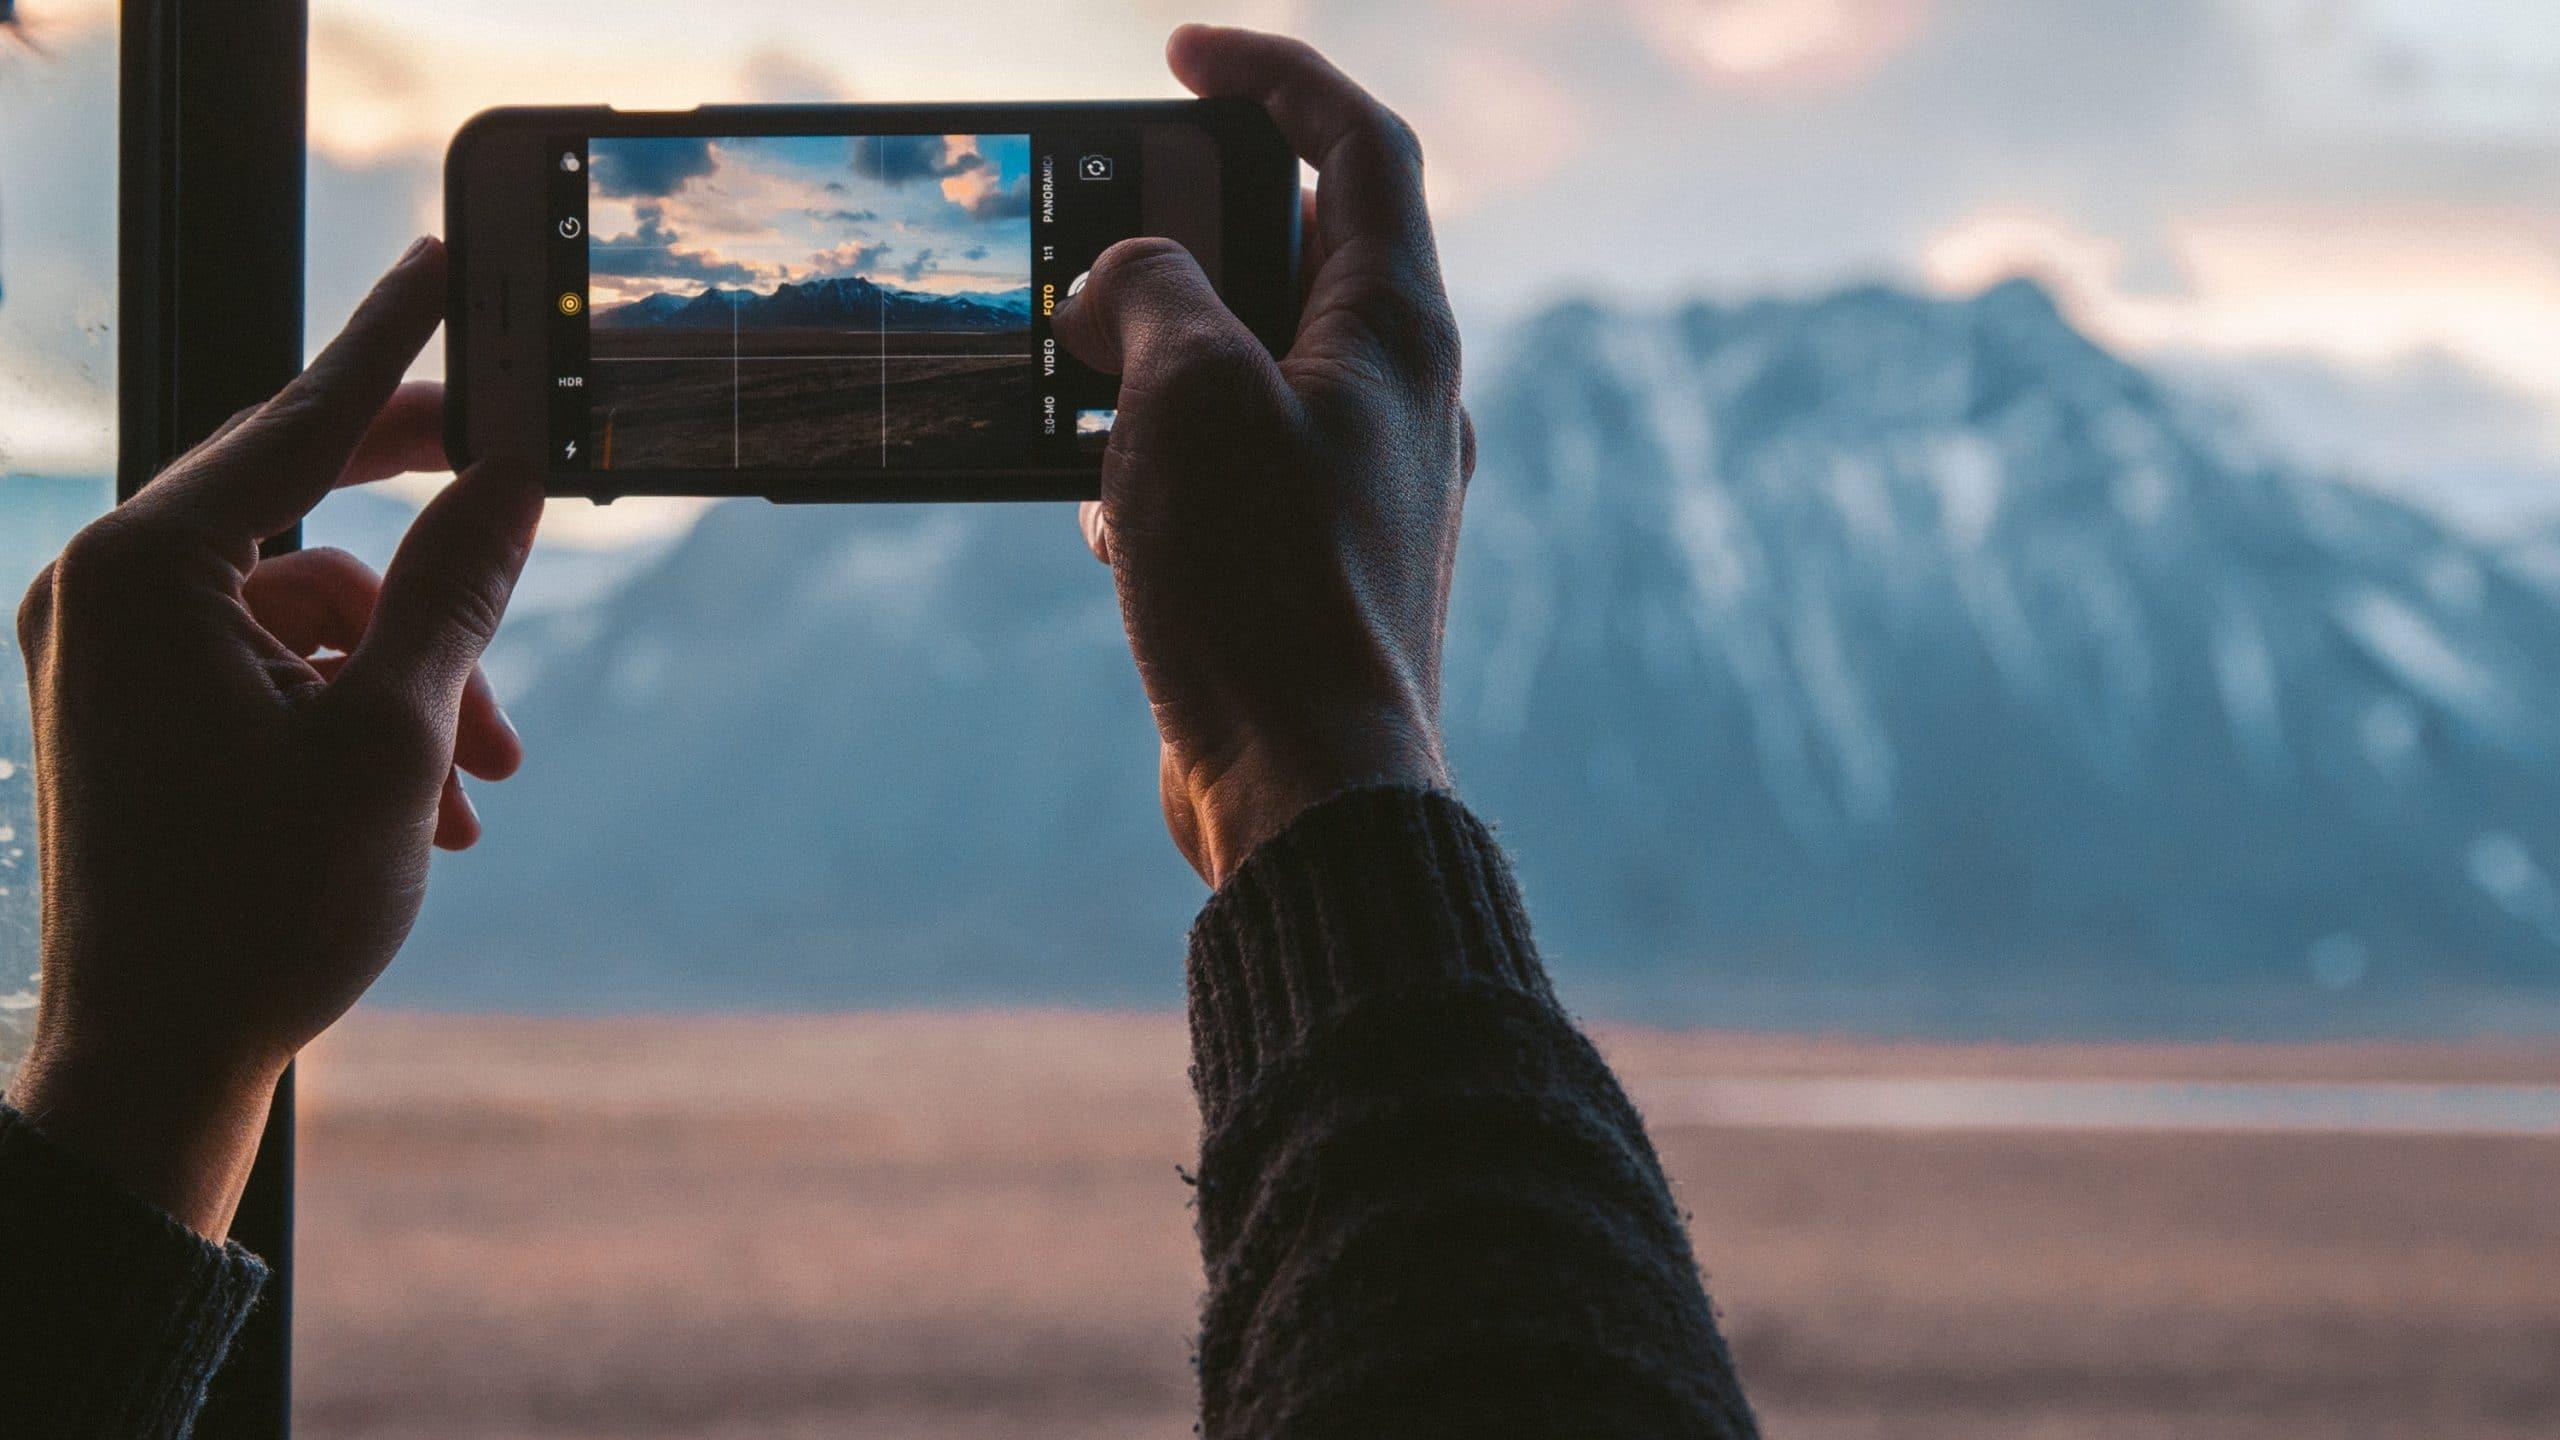 Long exposure phone photography